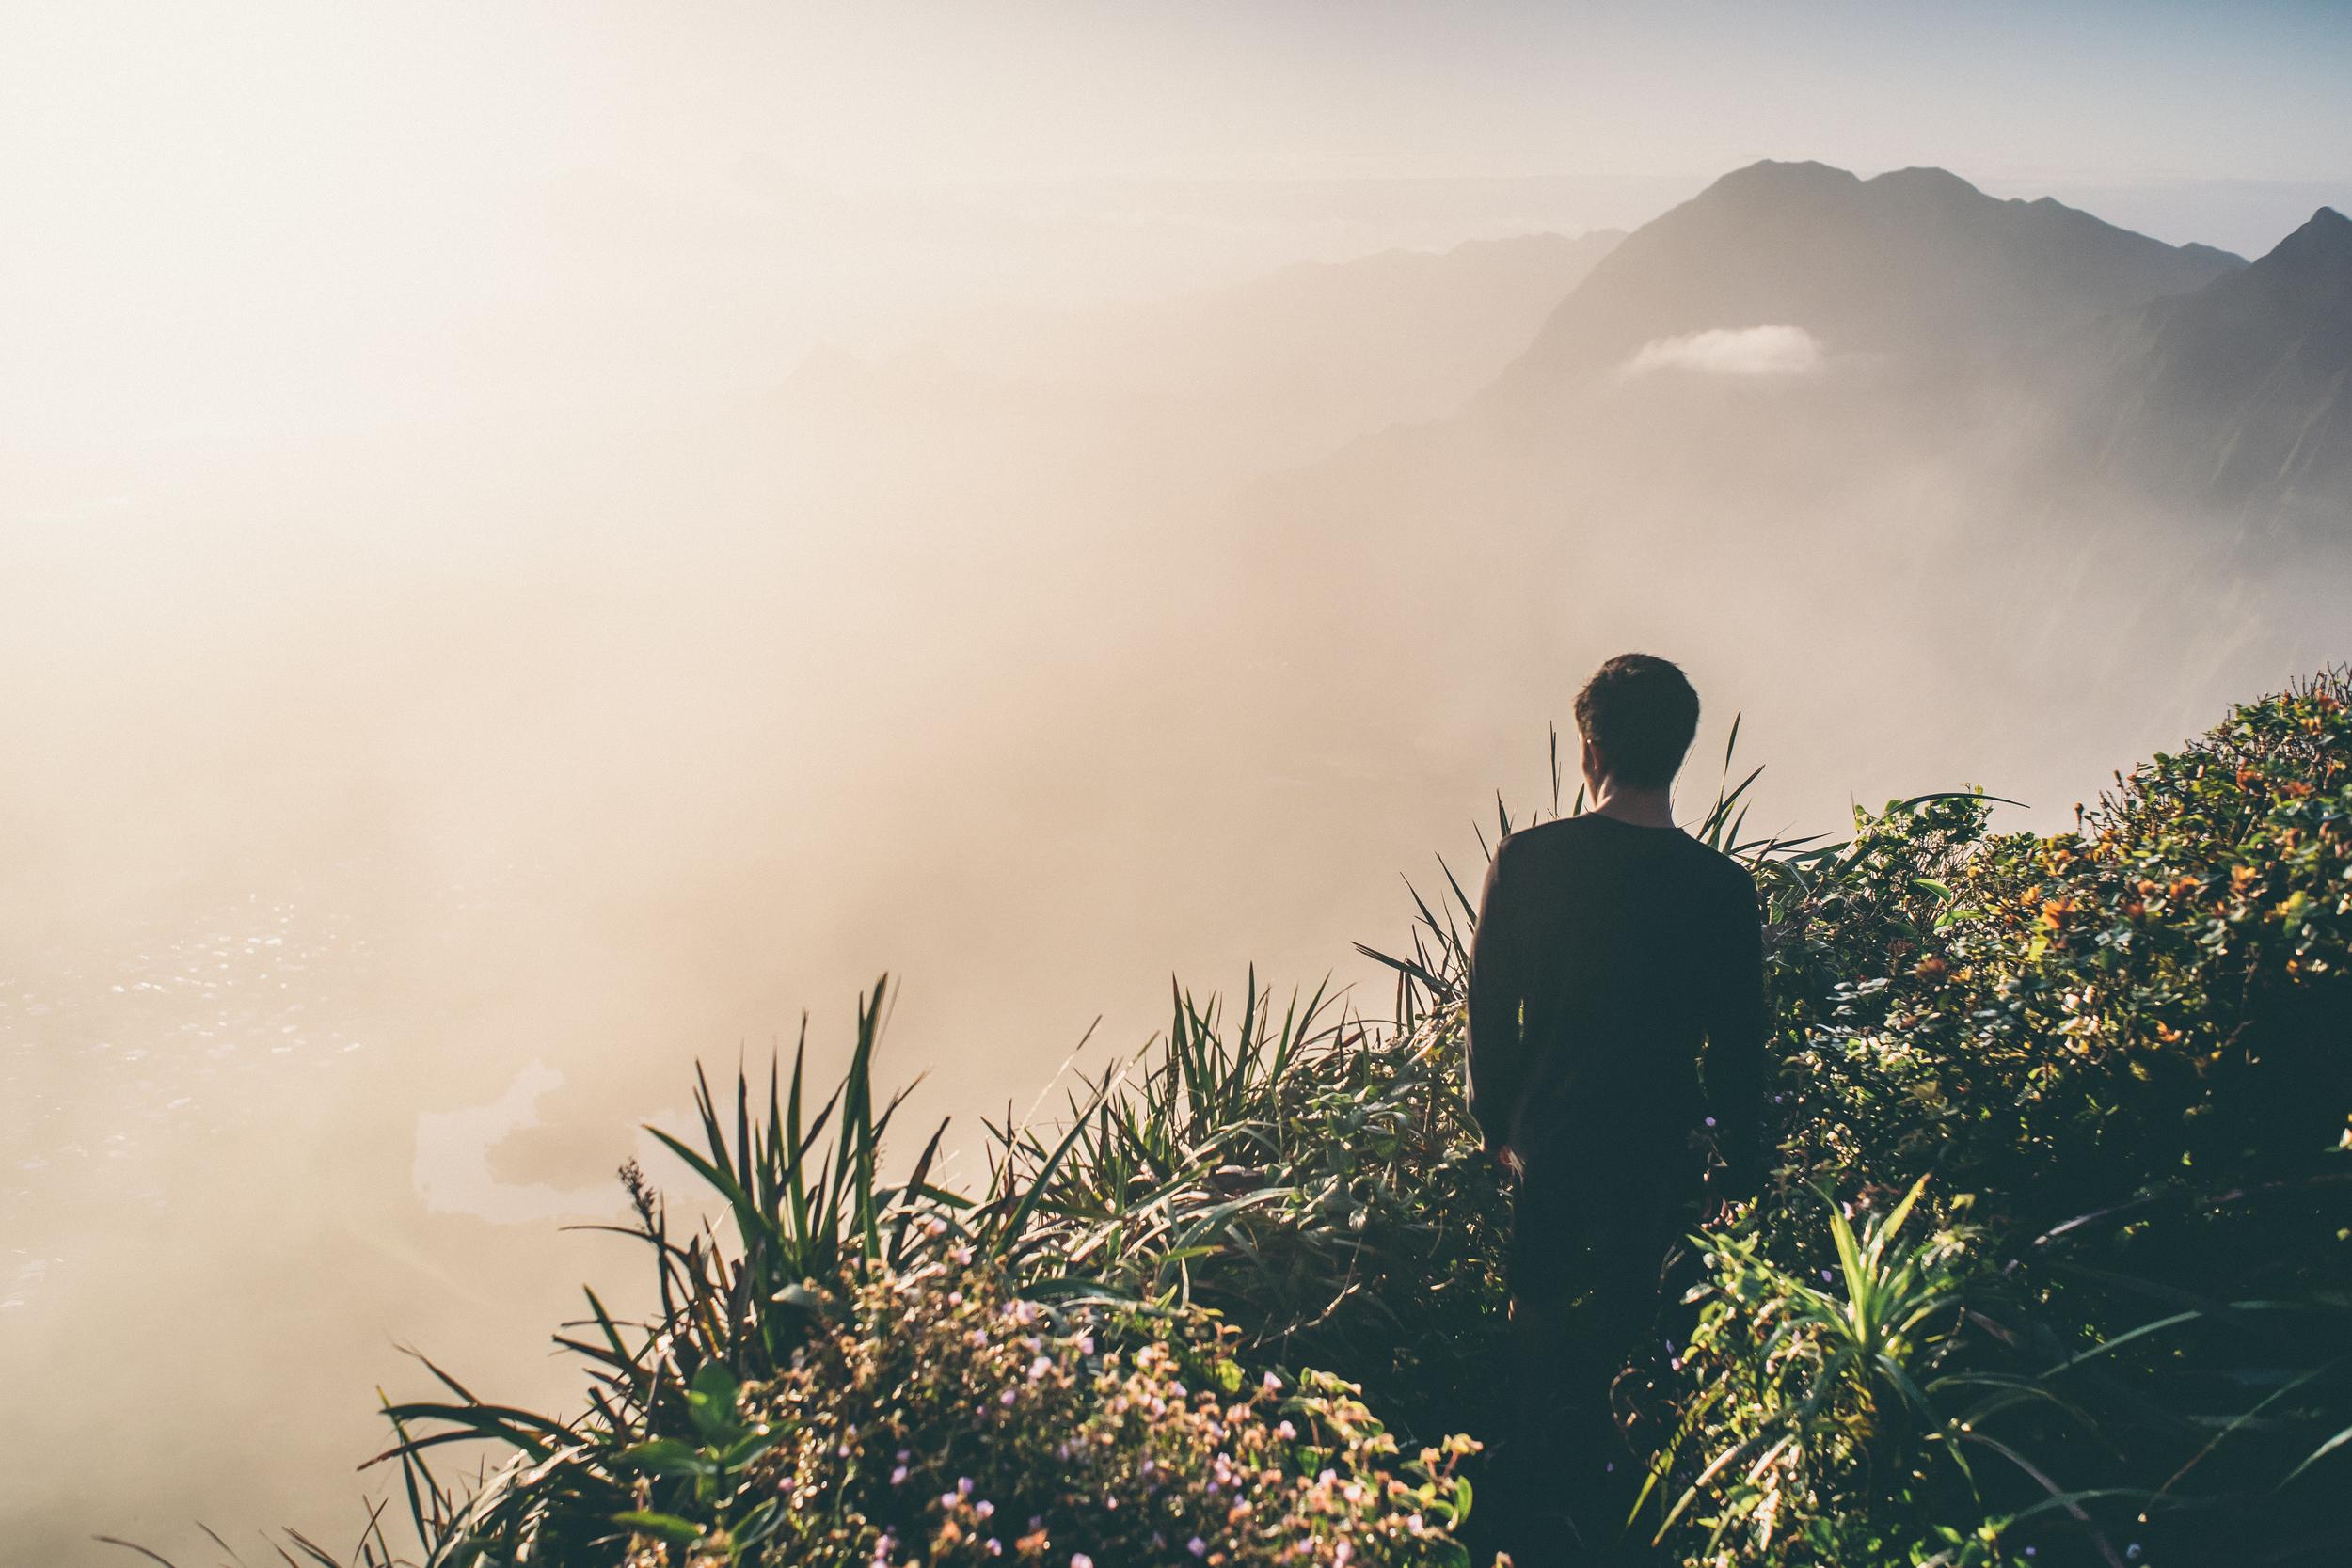 Rayce basking in the Hawaiian morning light.